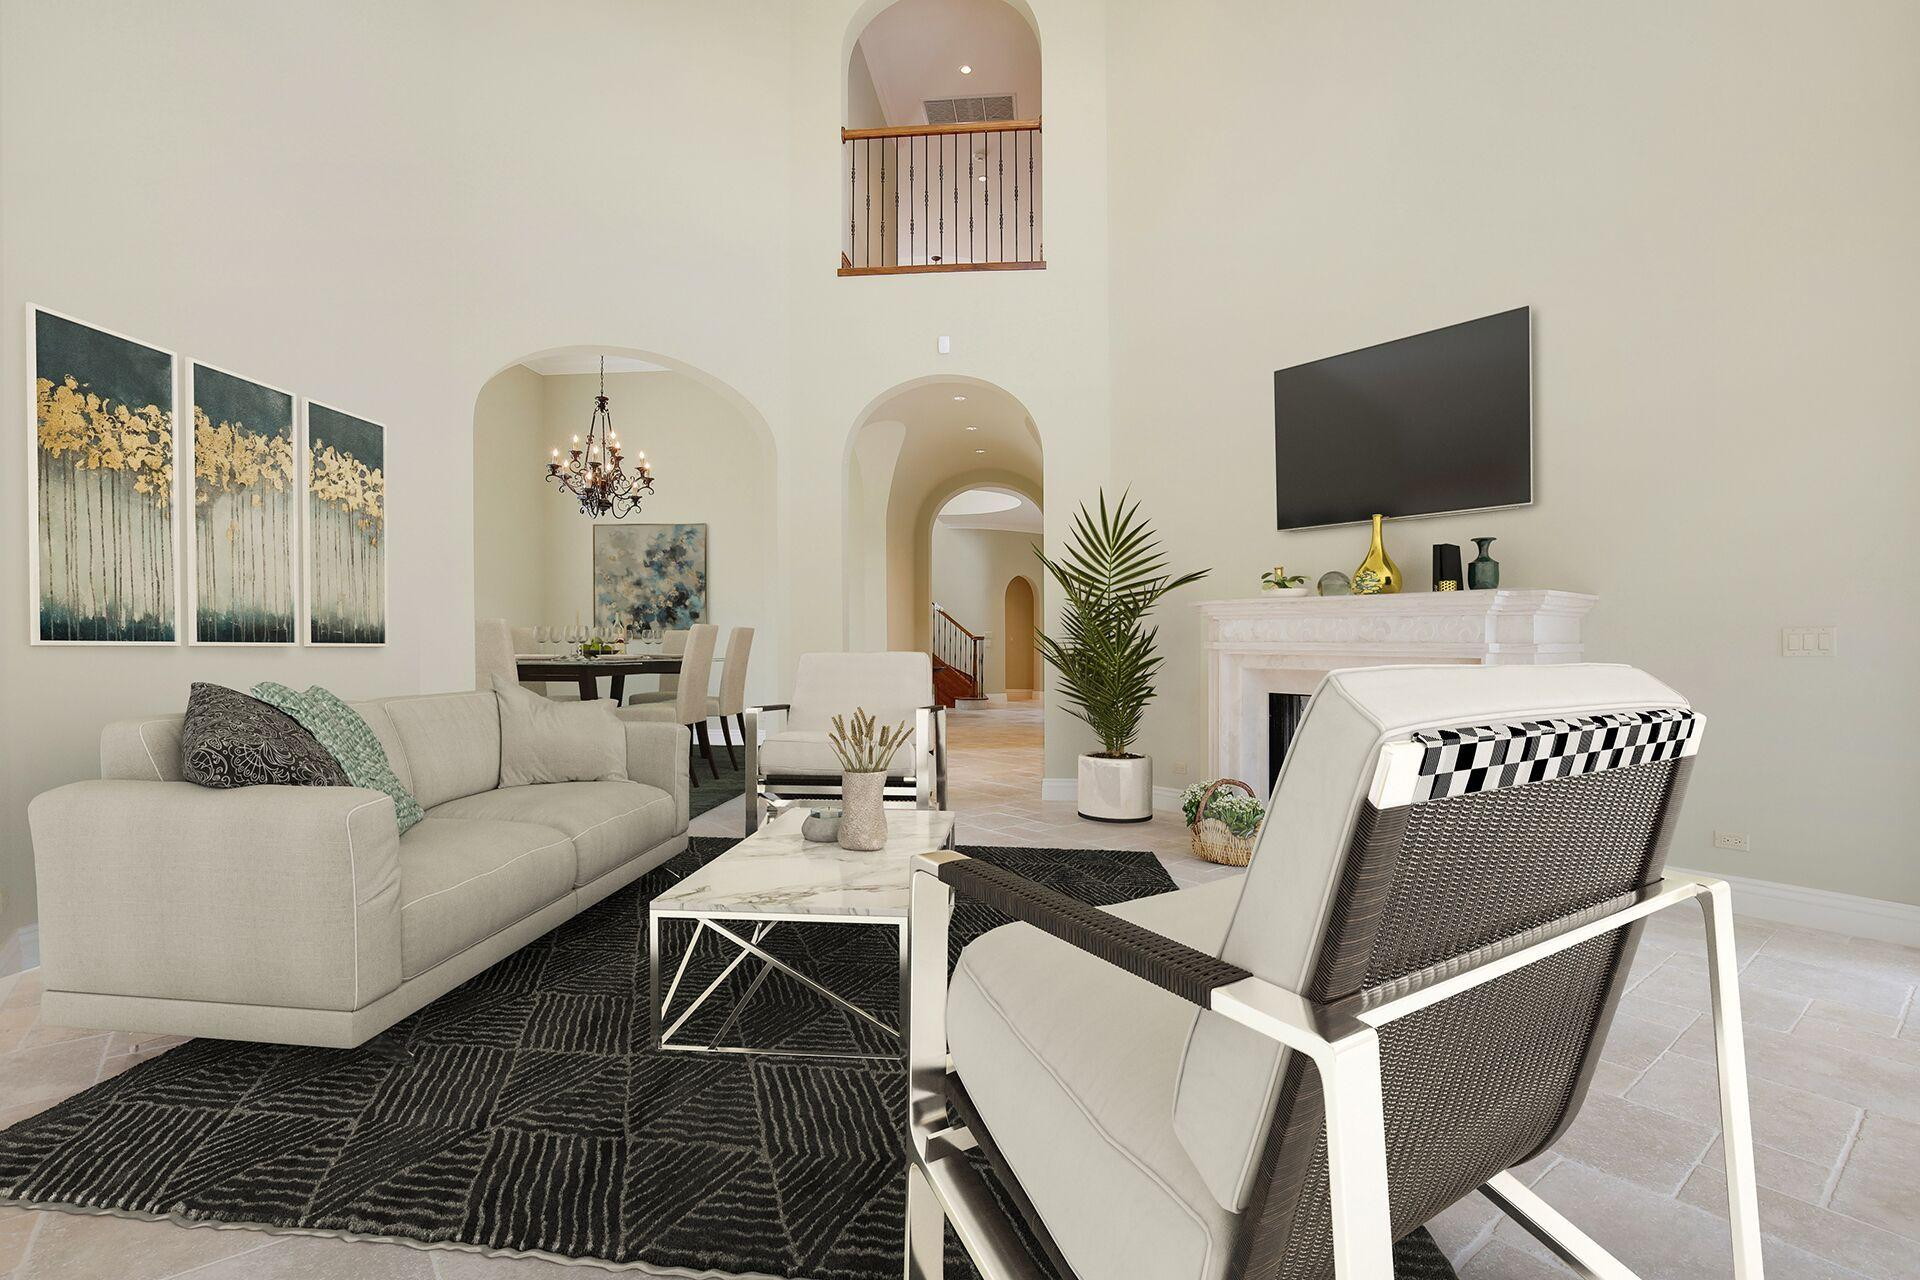 13741 Le Havre Drive, Palm Beach Gardens, Florida 33410, 5 Bedrooms Bedrooms, ,5.1 BathroomsBathrooms,A,Single family,Le Havre,RX-10451127